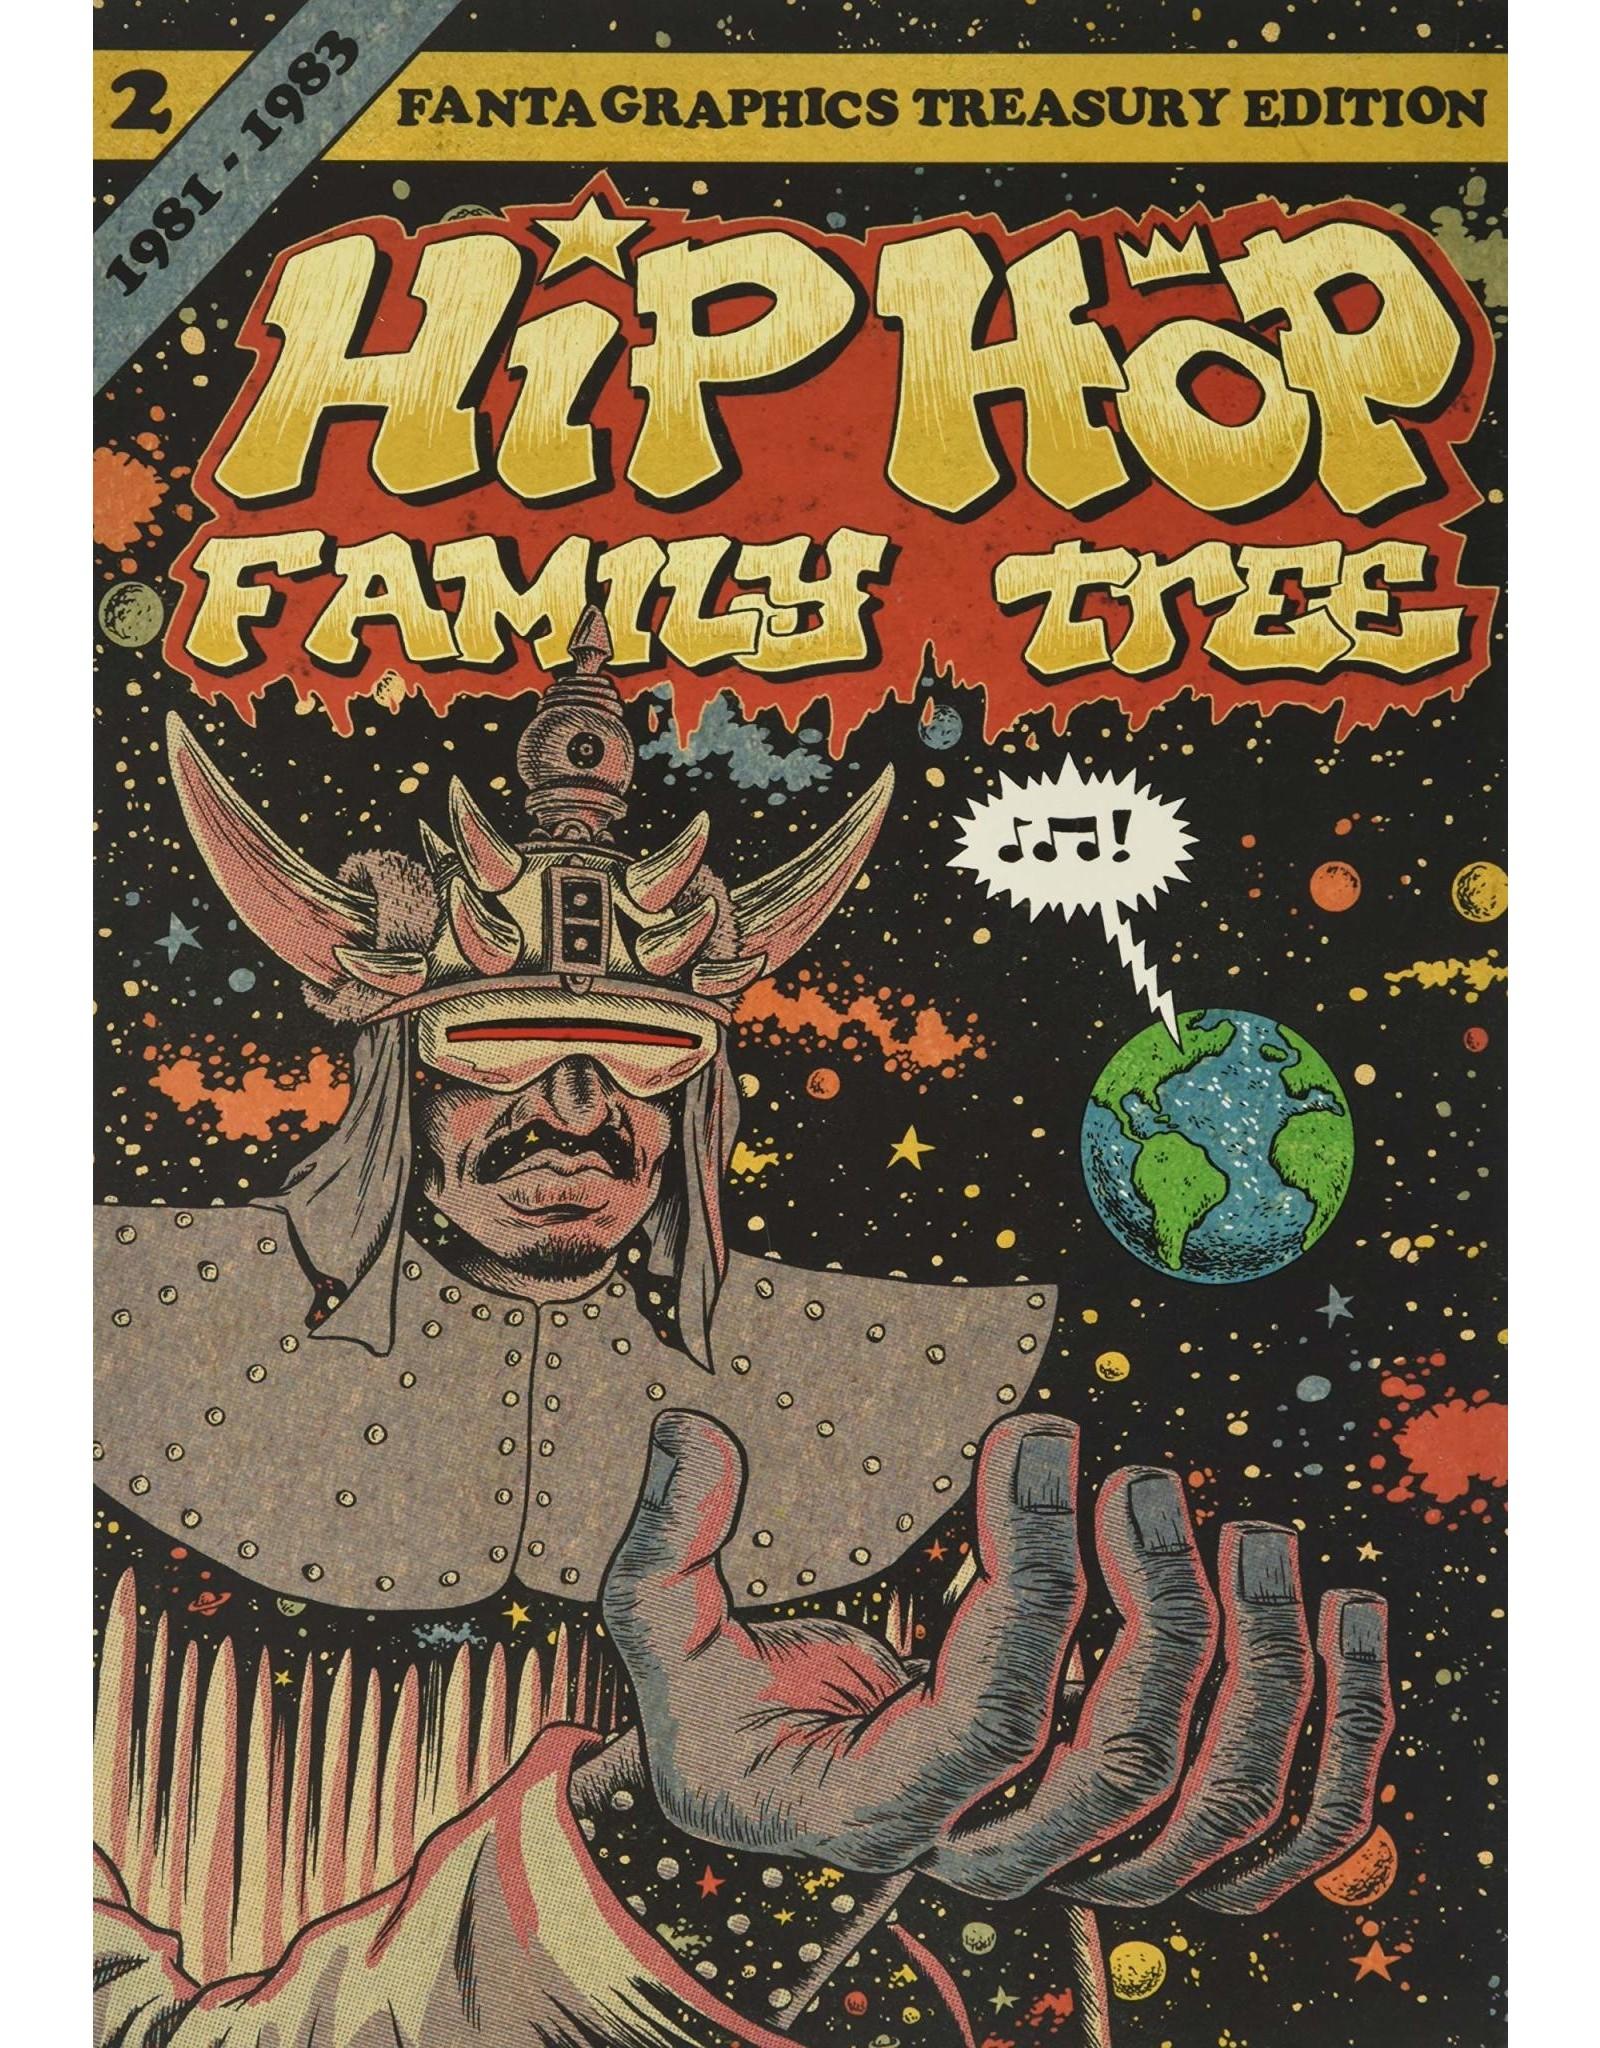 FANTAGRAPHICS BOOKS HIP HOP FAMILY TREE GN VOL 02 1981-1983